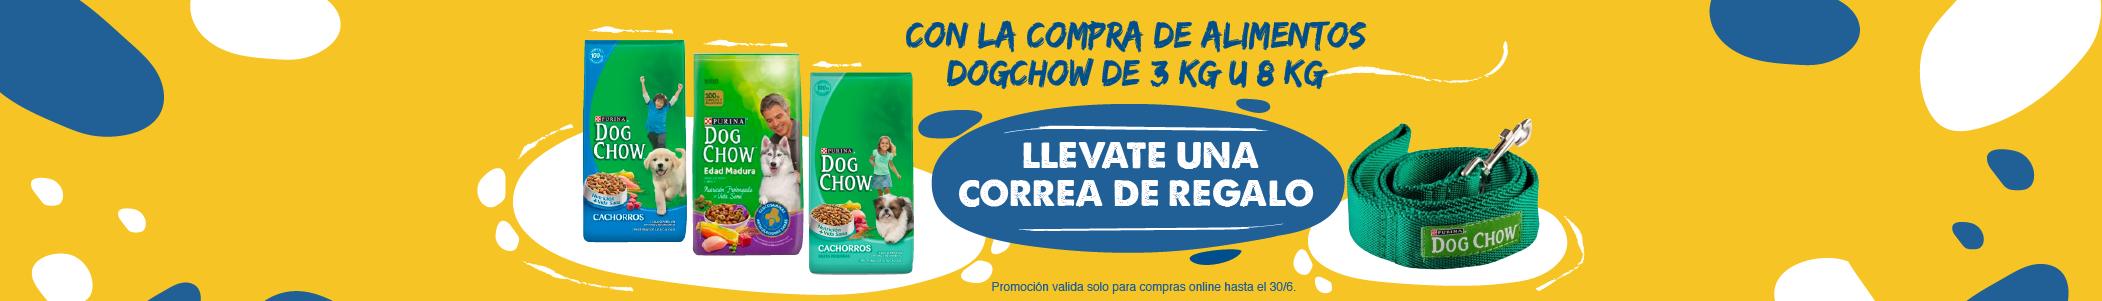 Correa Dog Chow